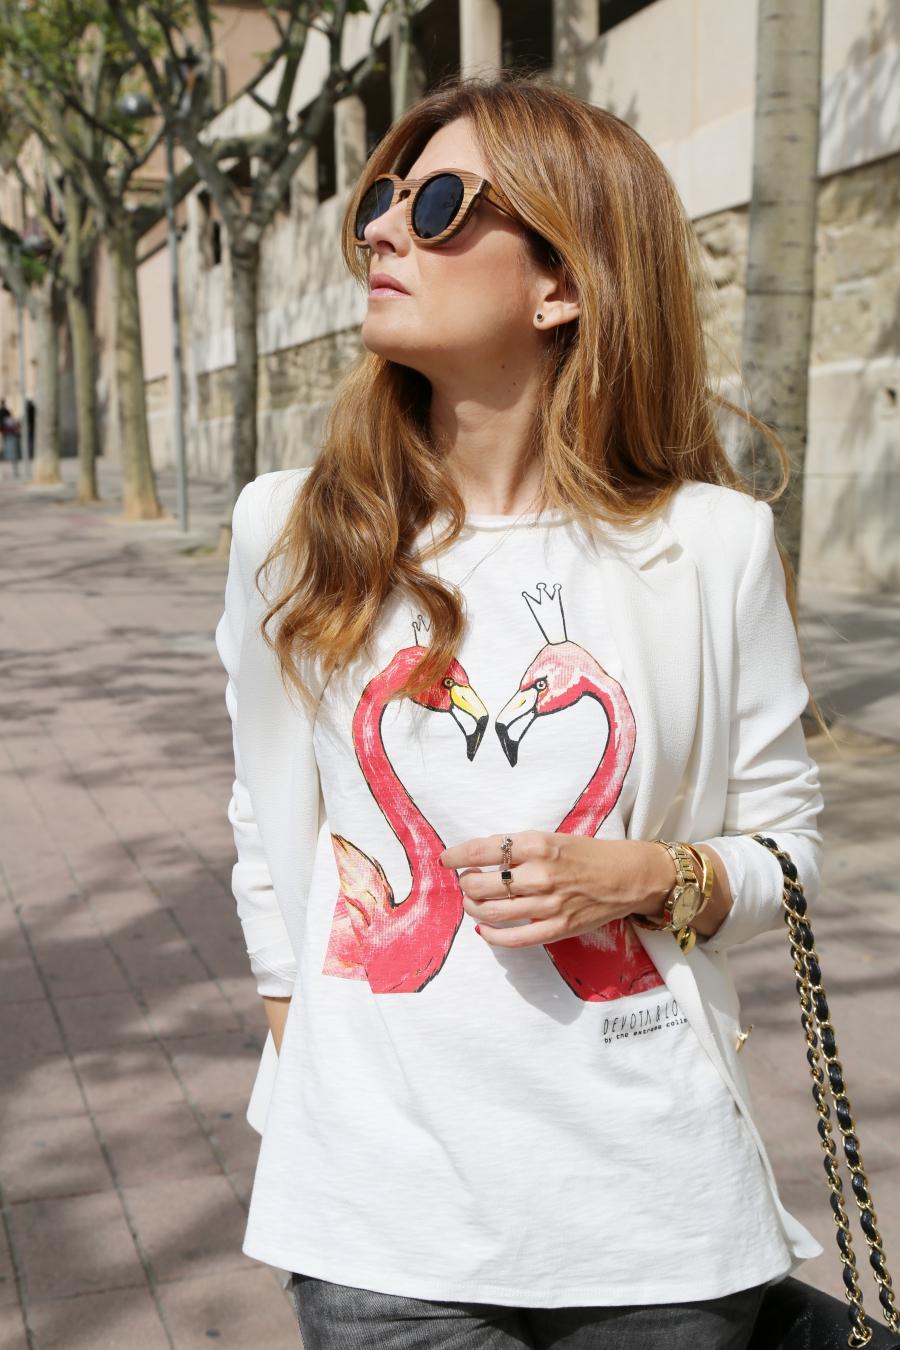 Rebeca Labara -  A trendy life